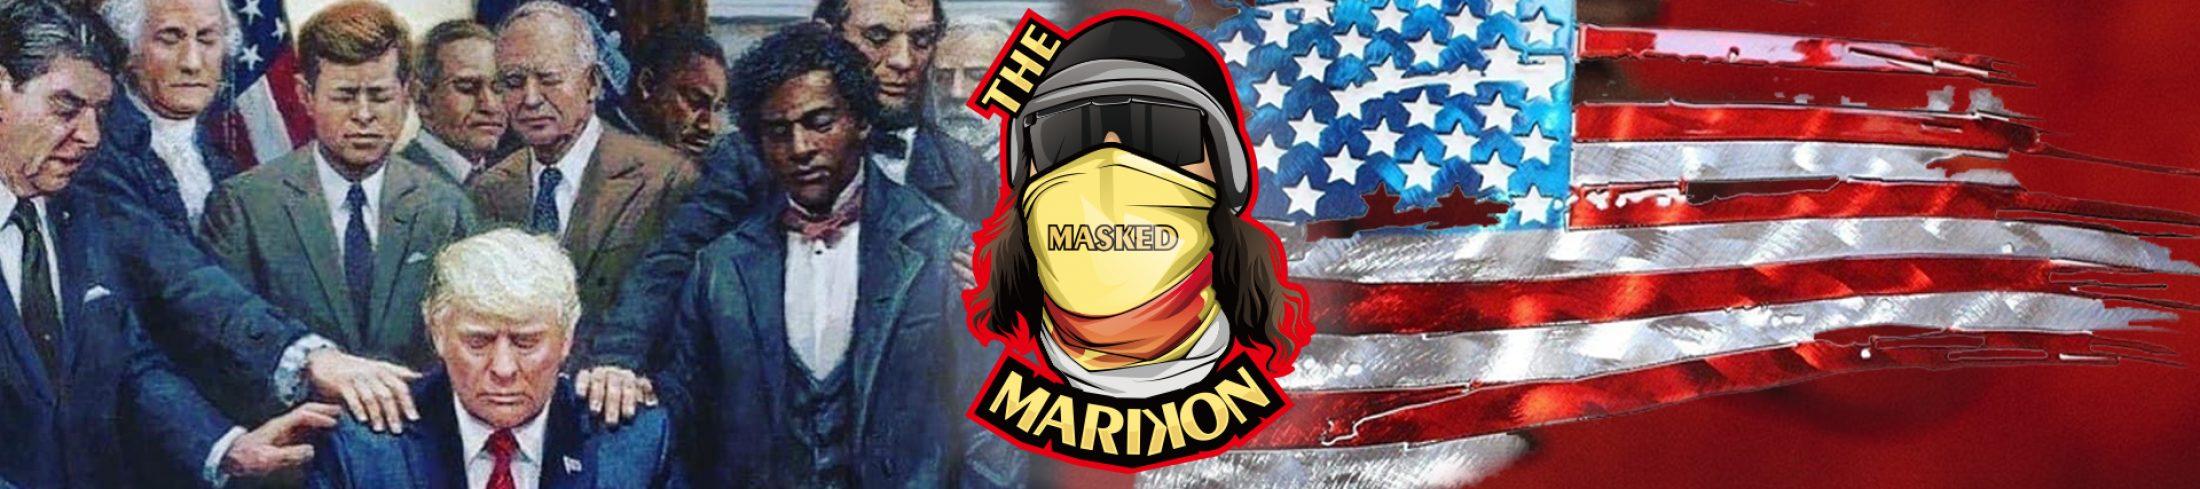 The Masked Marikon